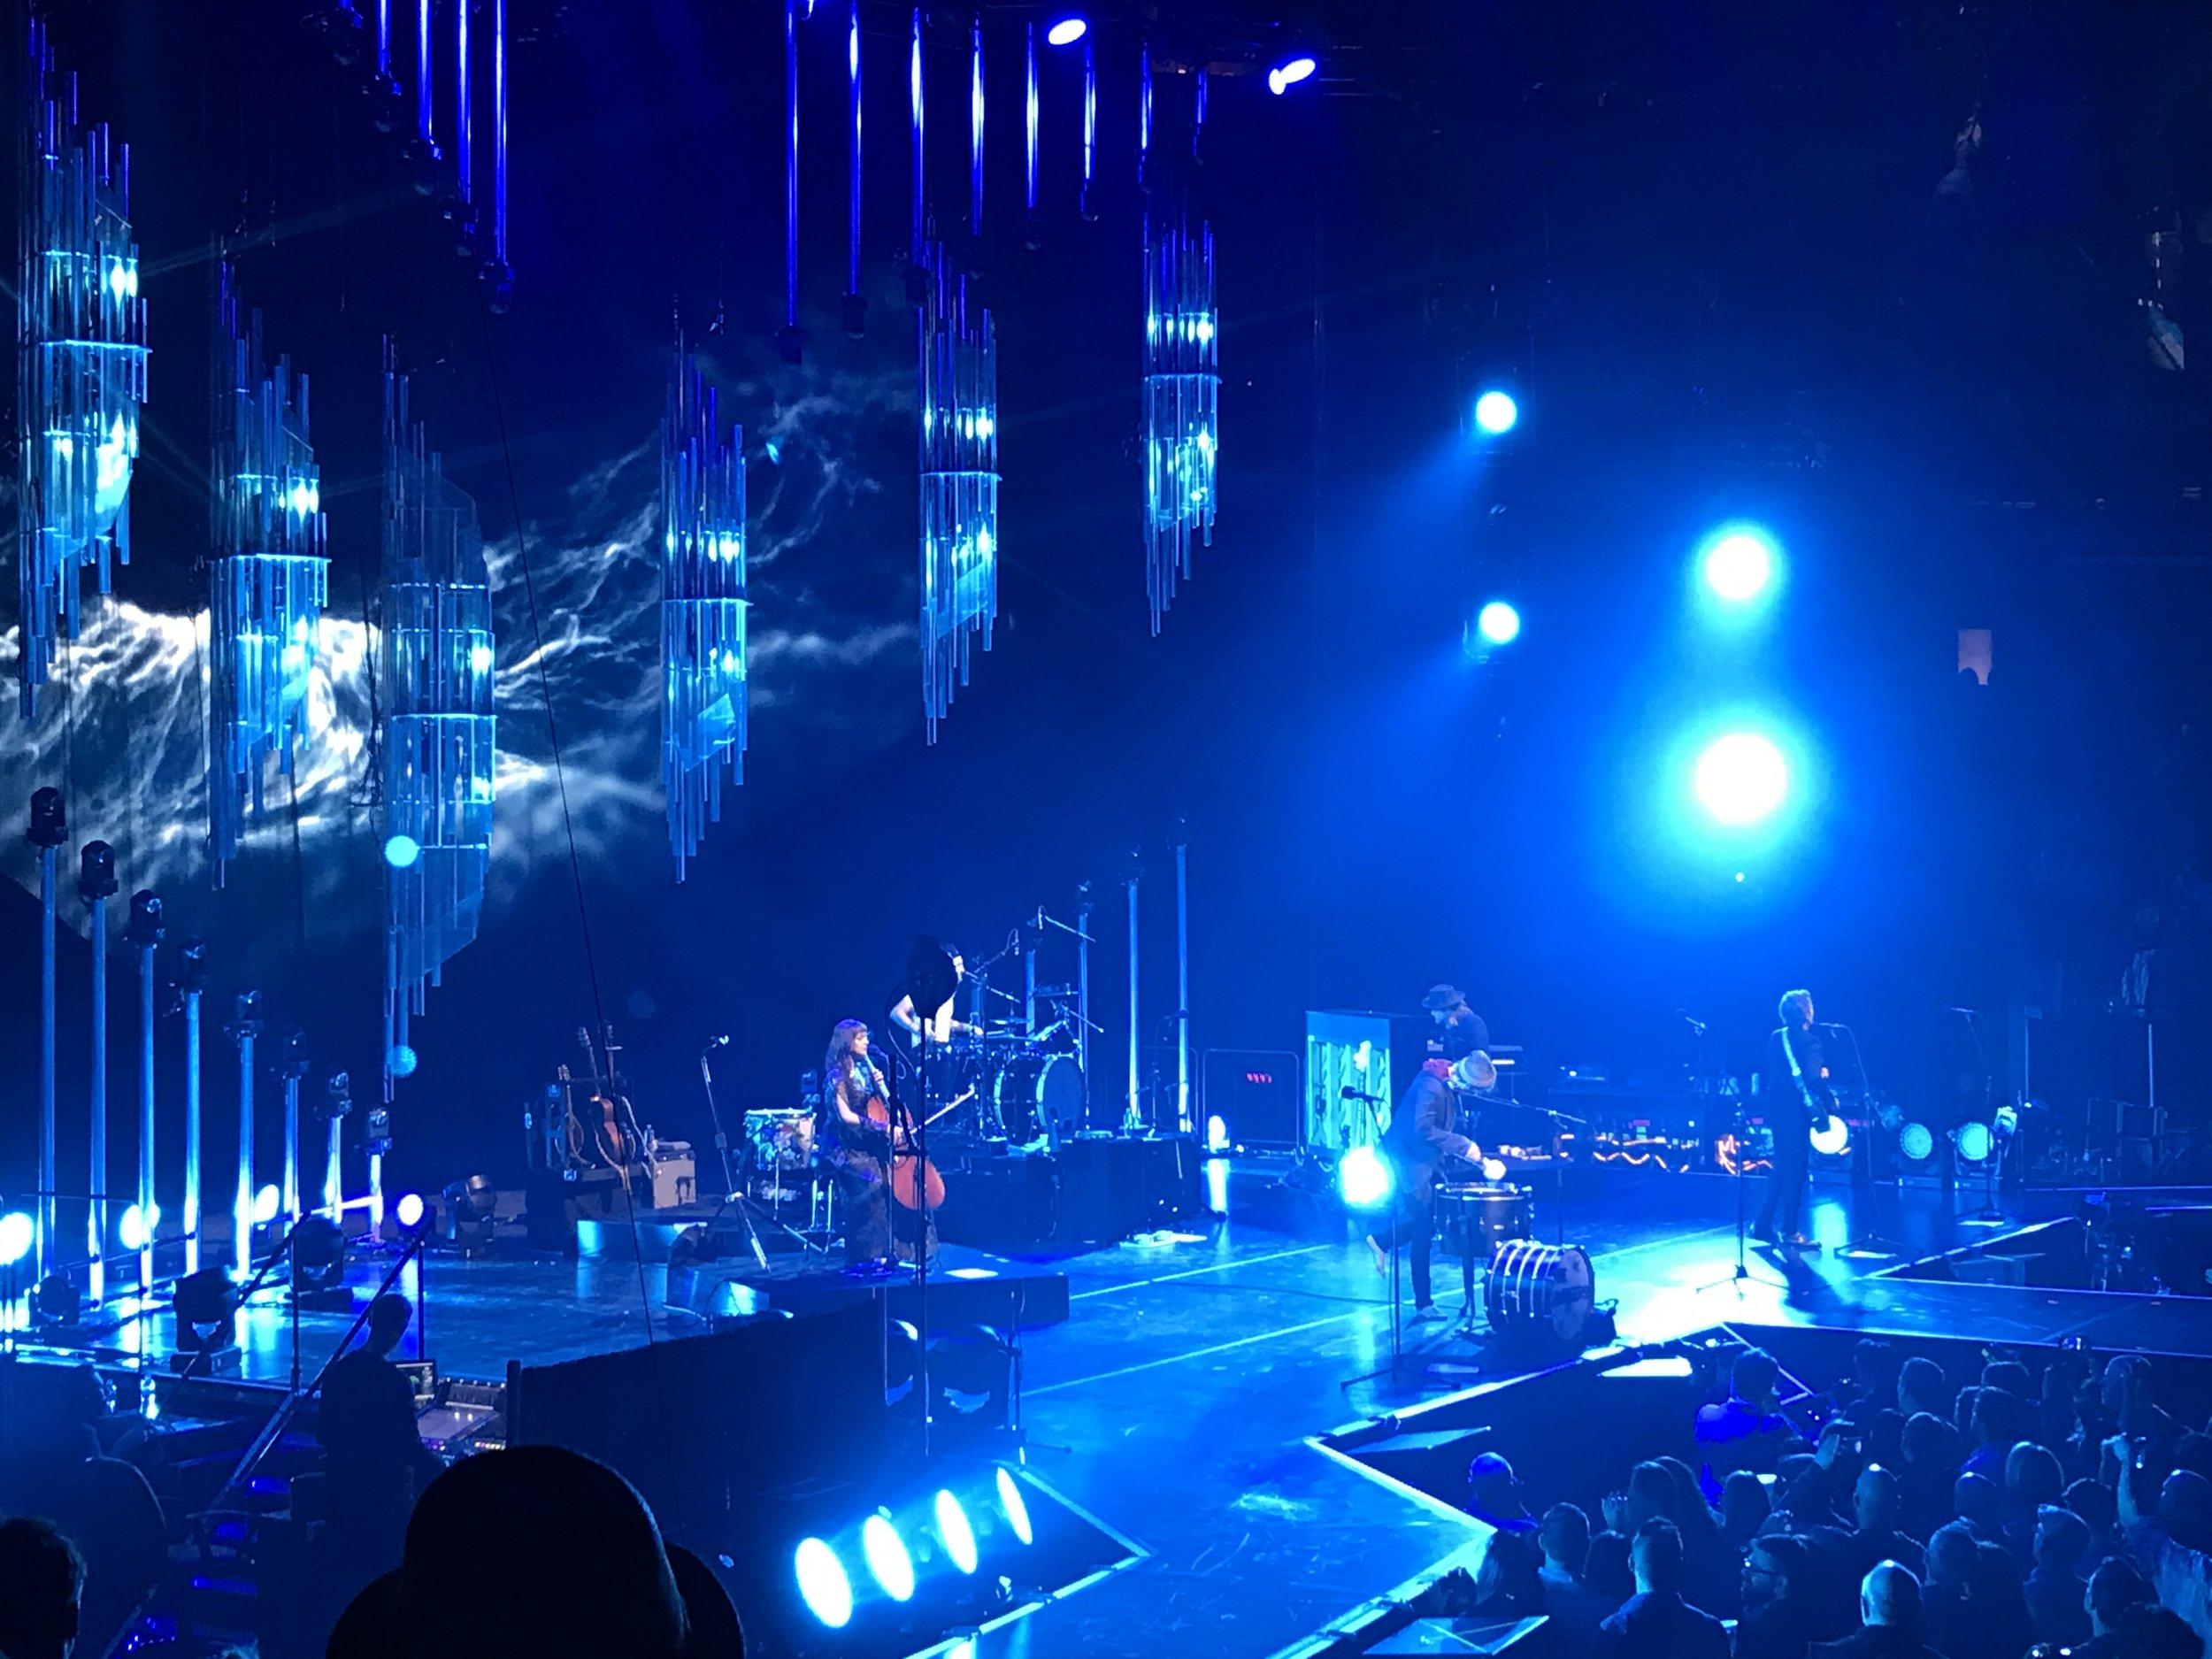 The Illumineers on the main stage